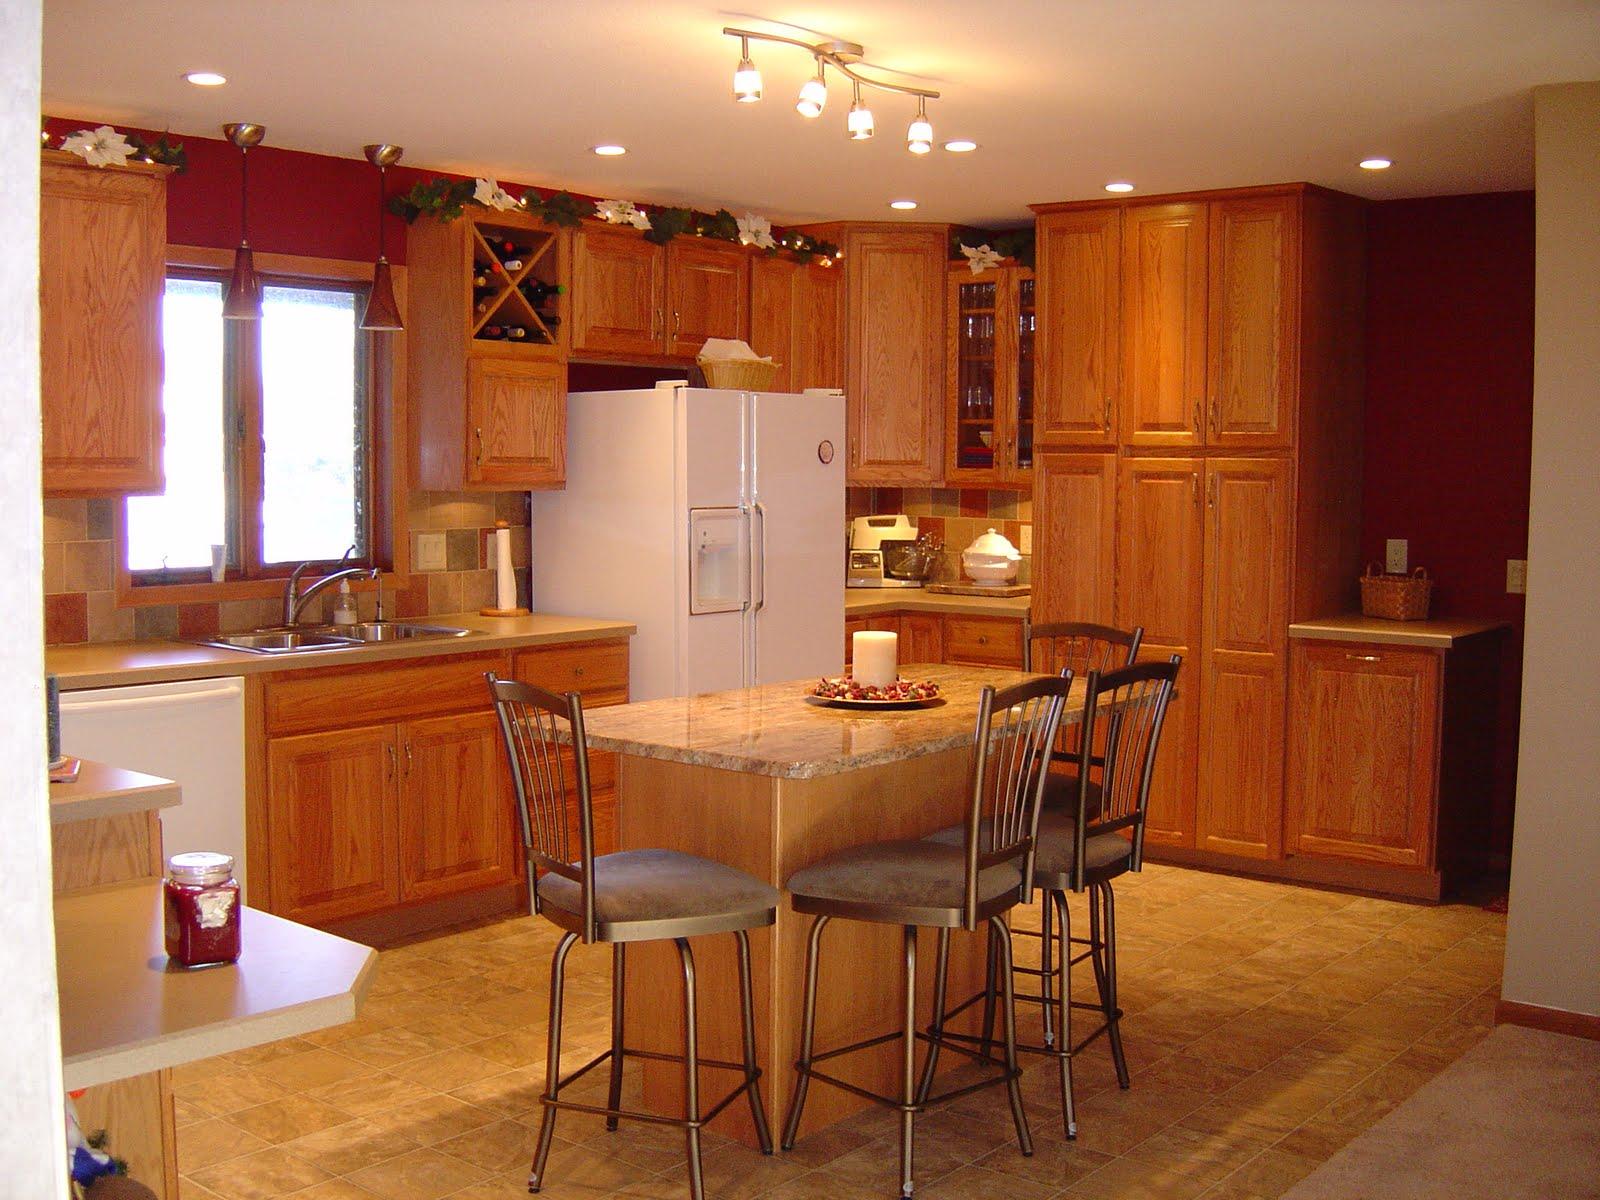 KraftMaid Oak Kitchen Cabinets